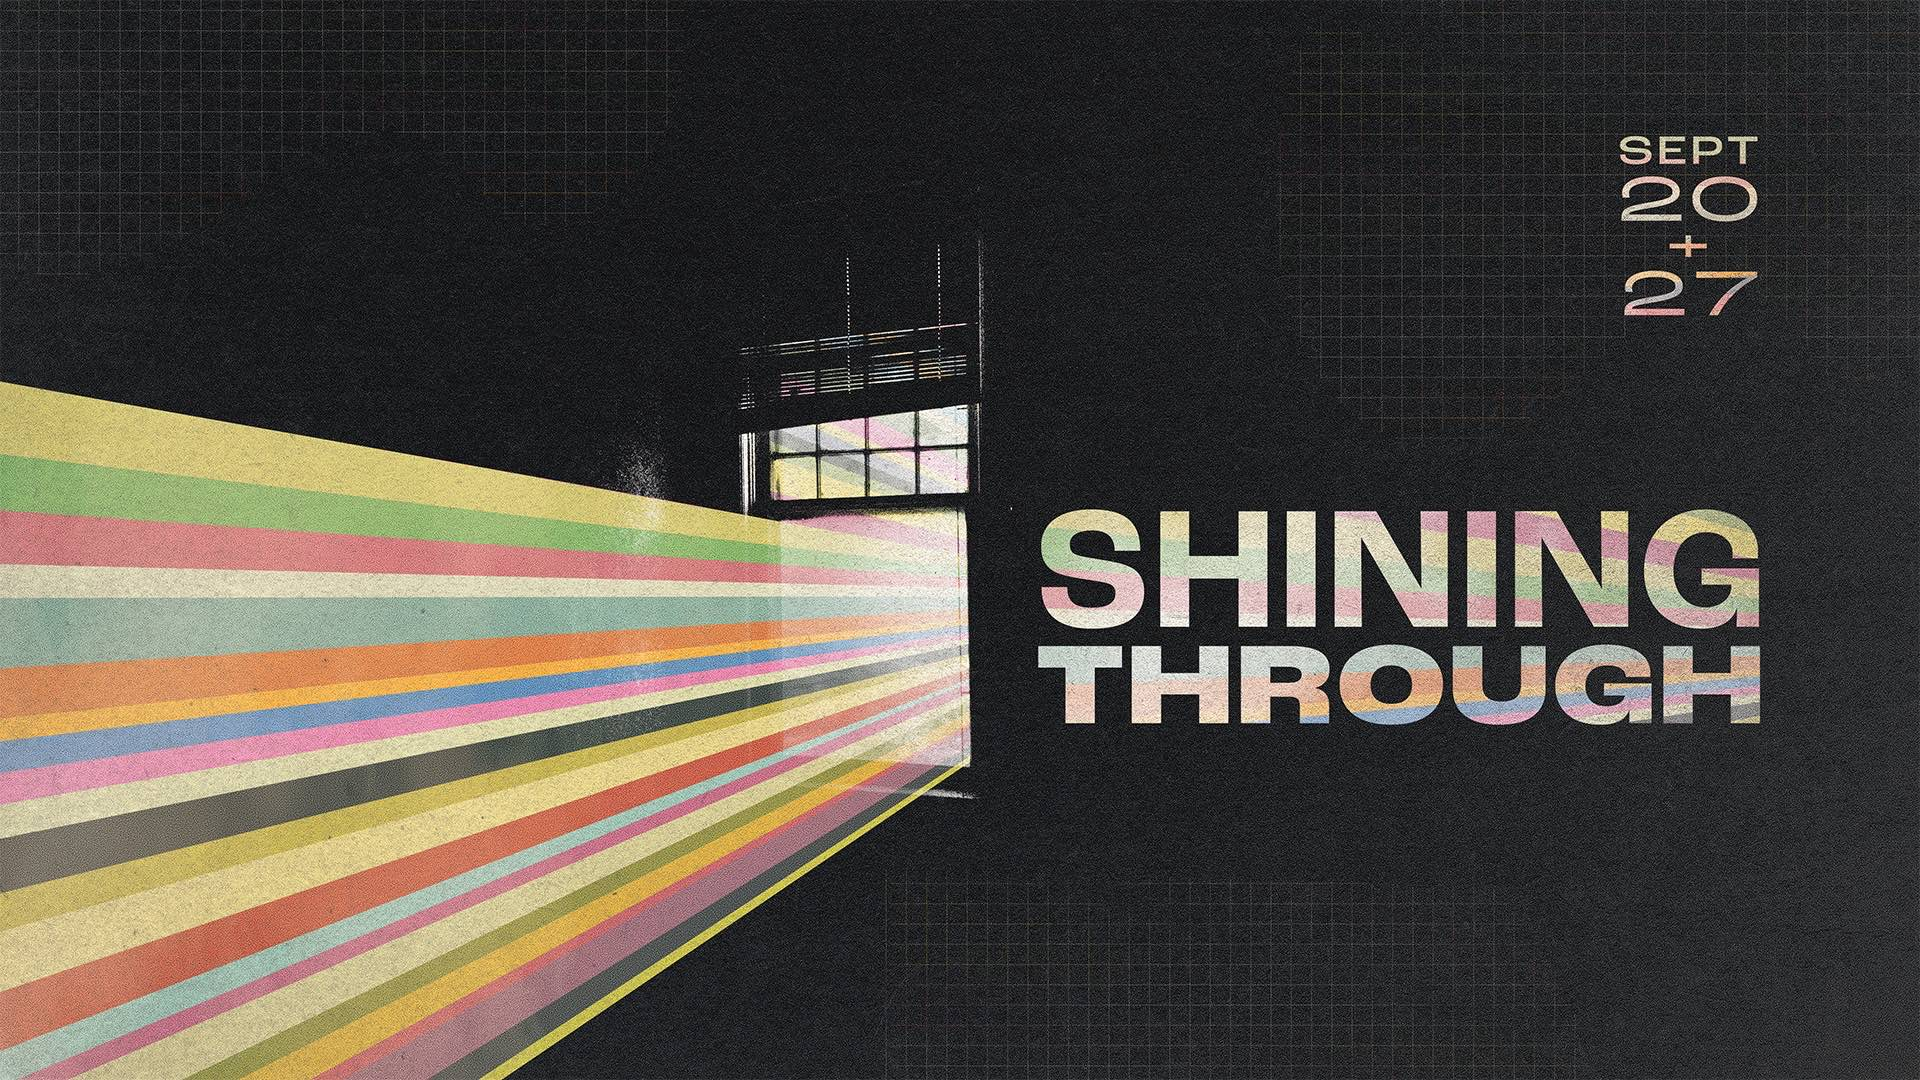 Shining Through